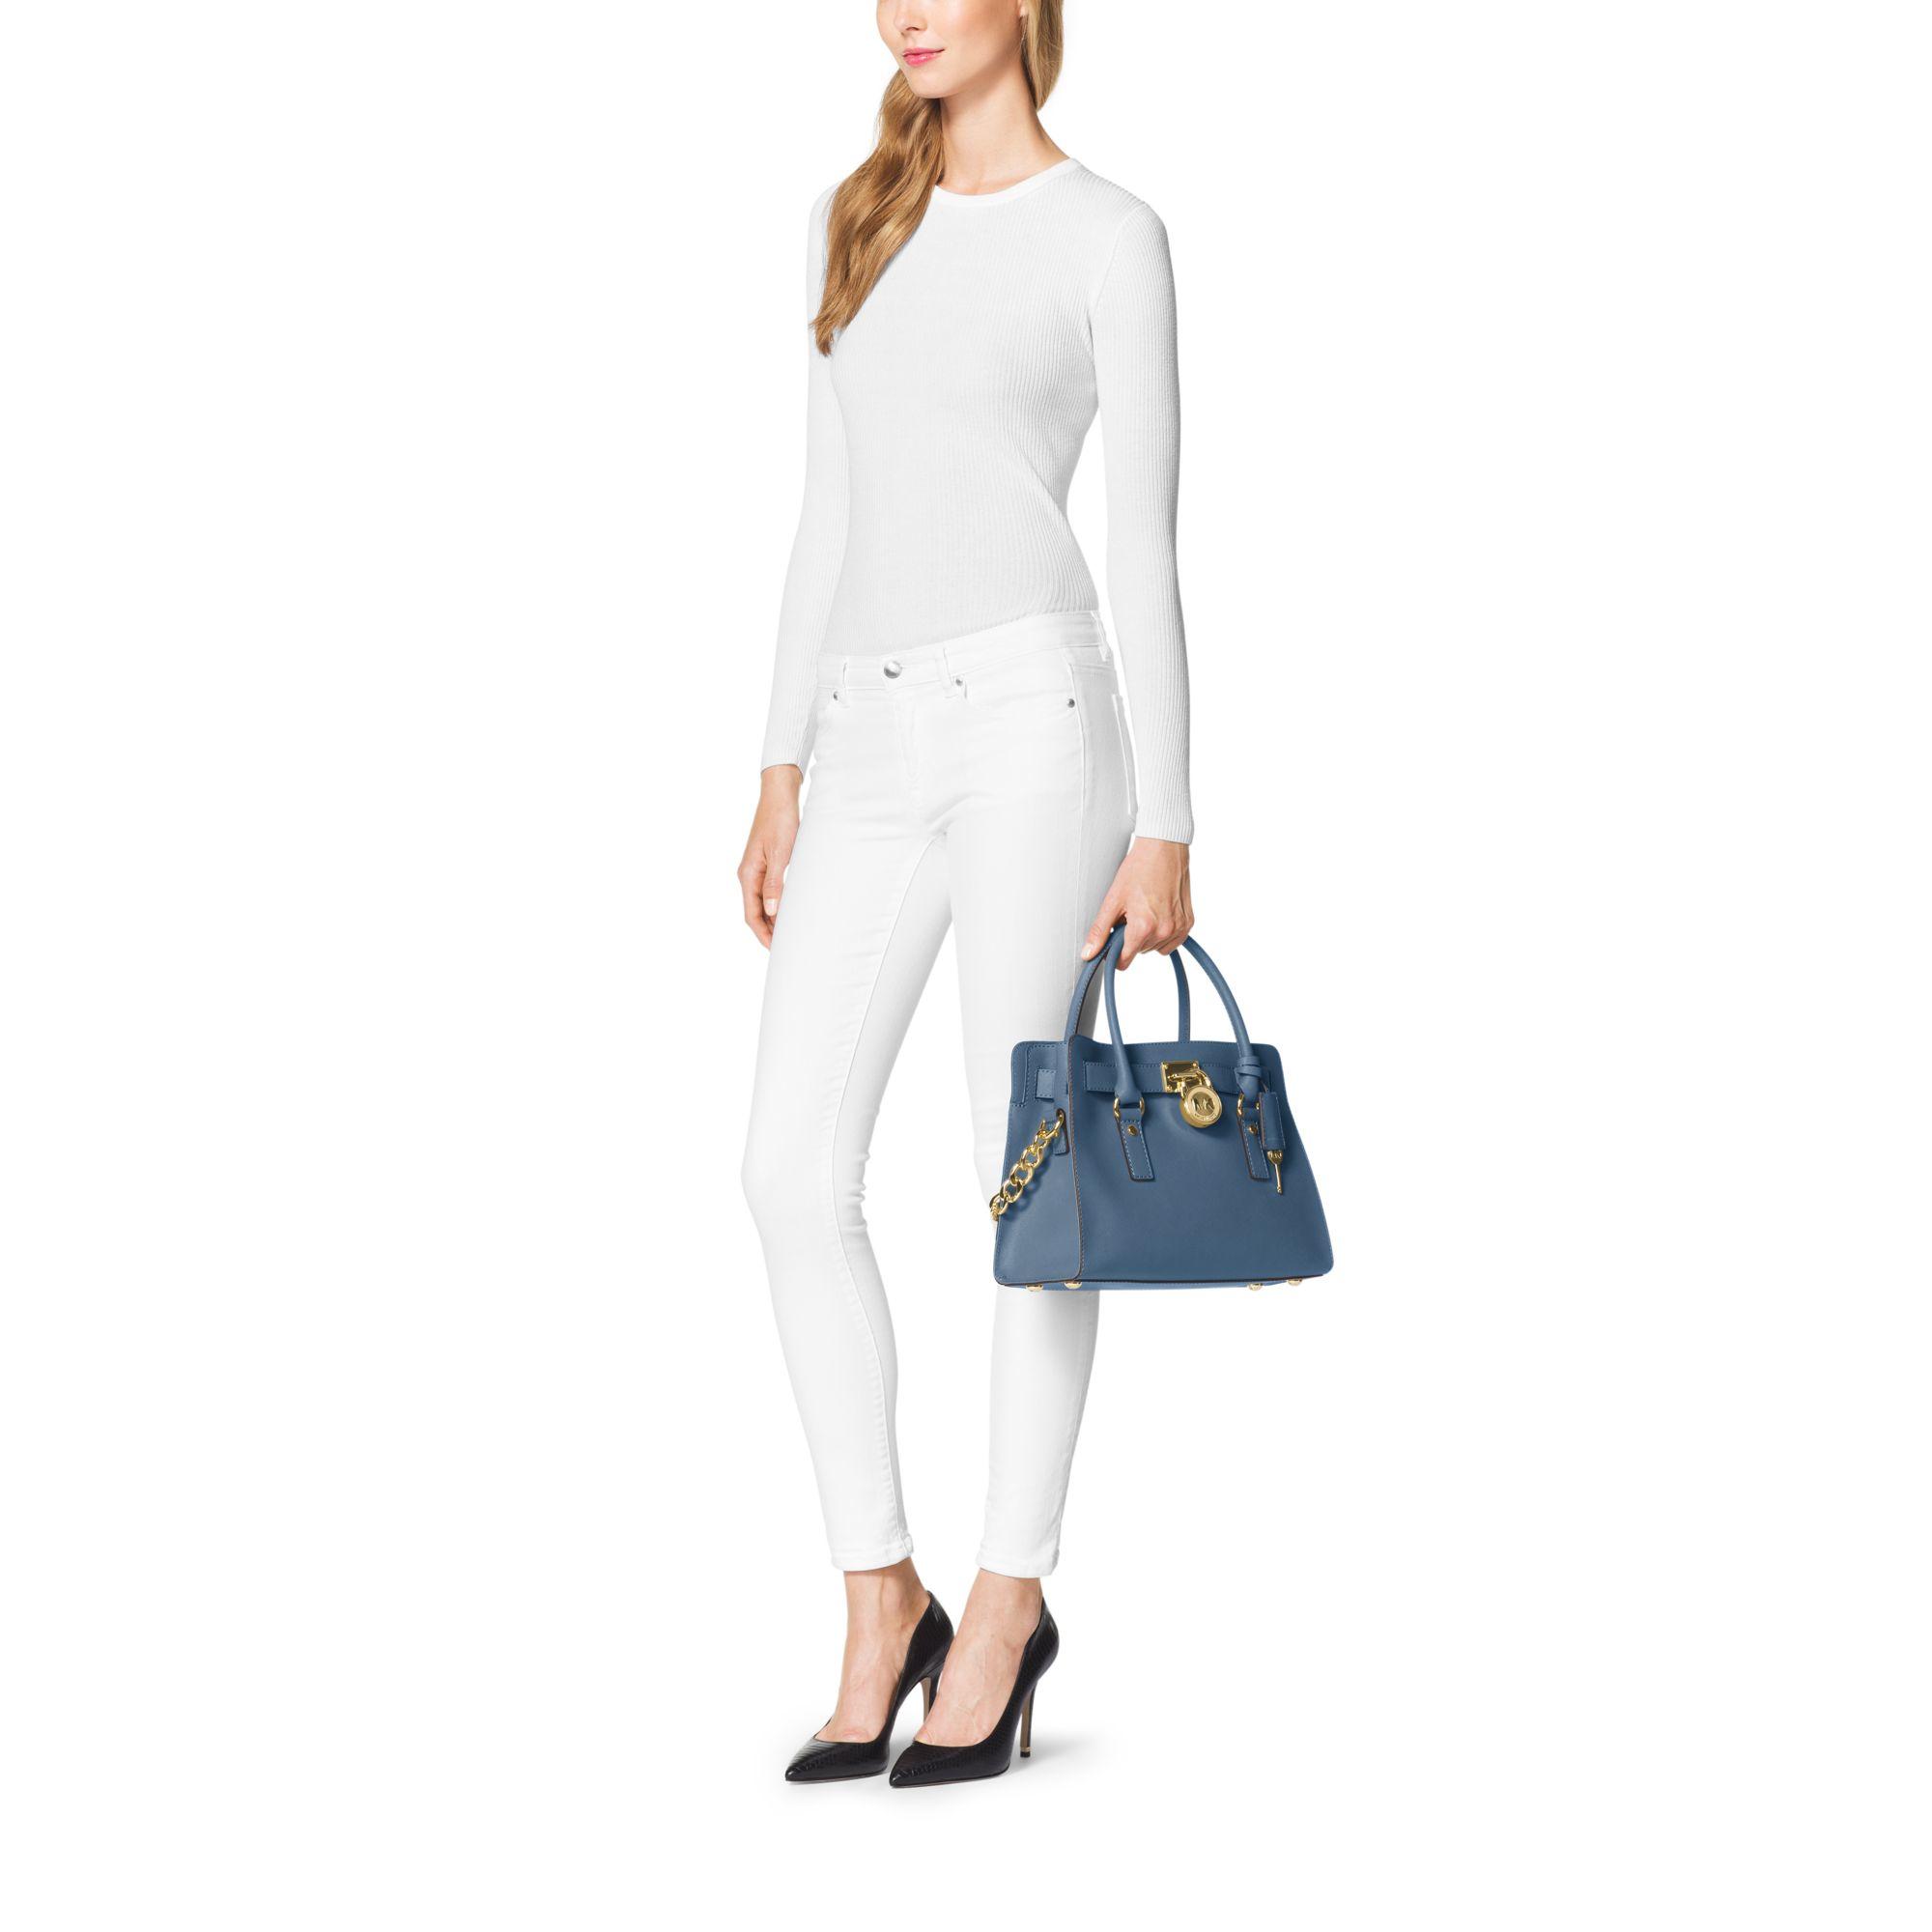 lyst michael kors hamilton saffiano leather medium satchel in blue rh lyst com